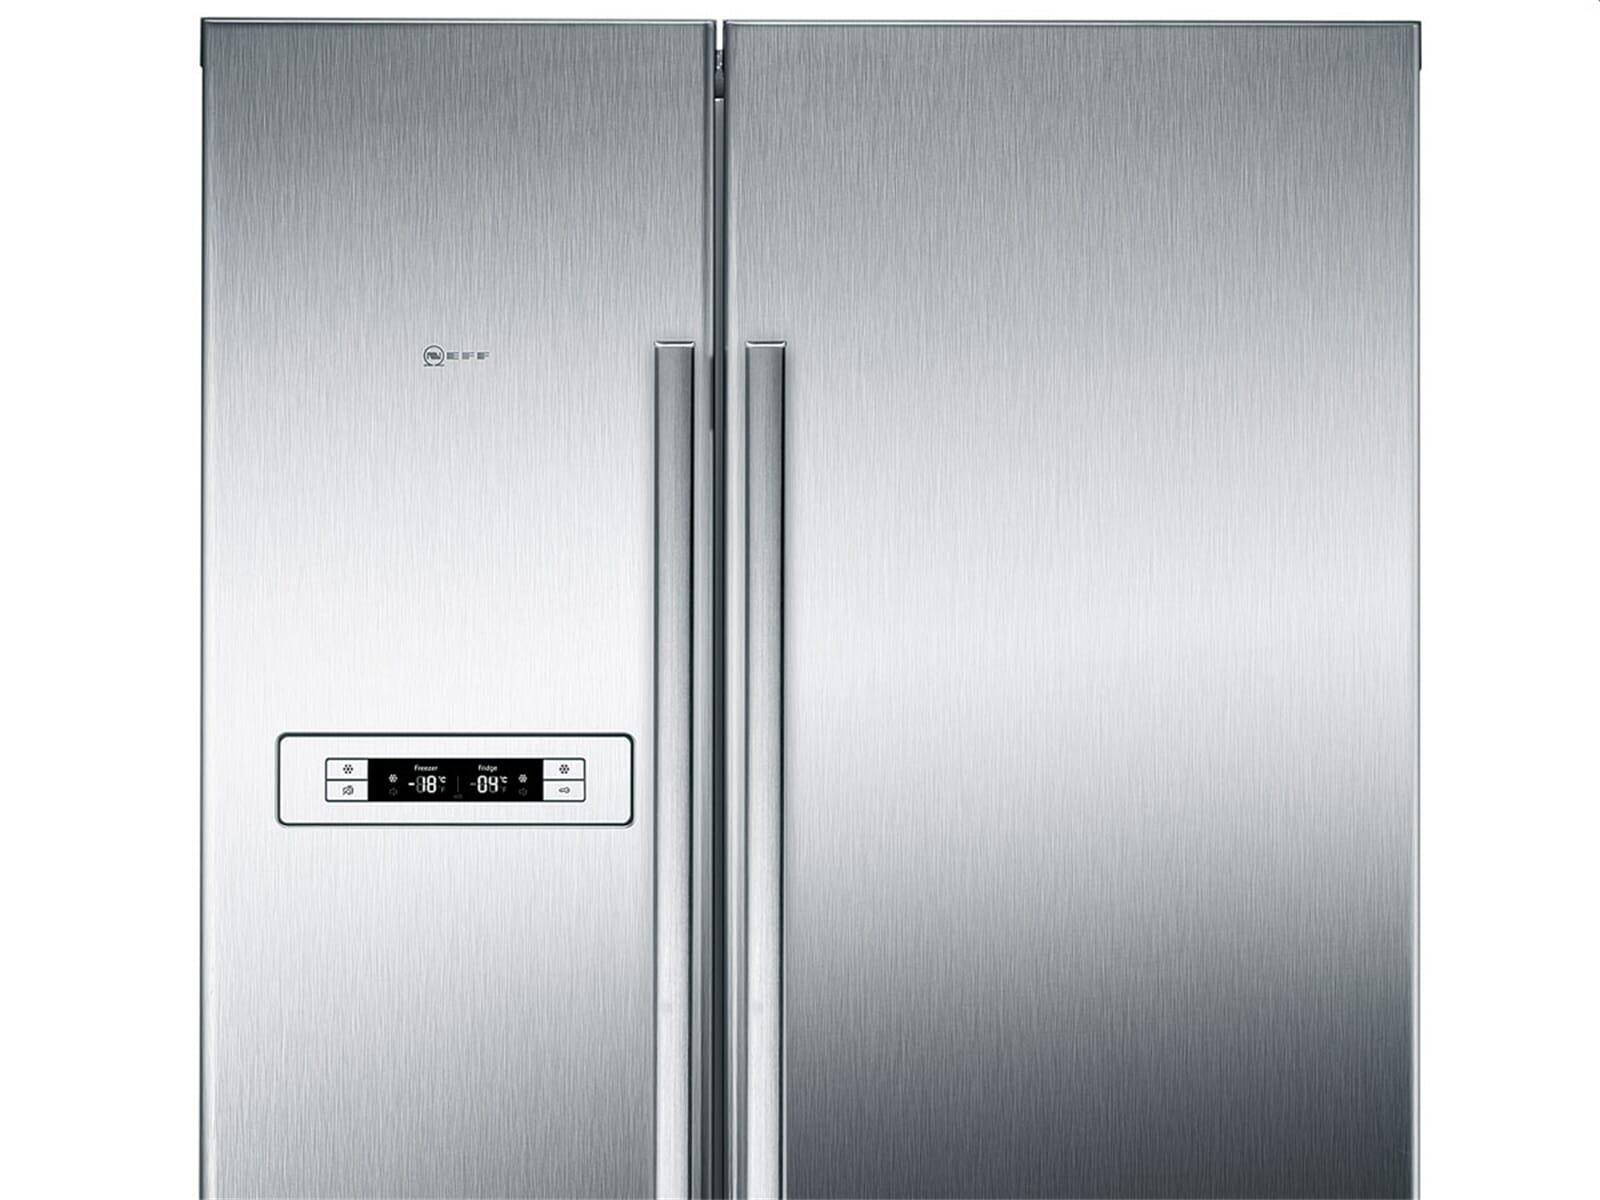 Neff Amerikanischer Kühlschrank Edelstahl : Neff ksa 778 a2 side by side kühl gefrier kombination edelstahl